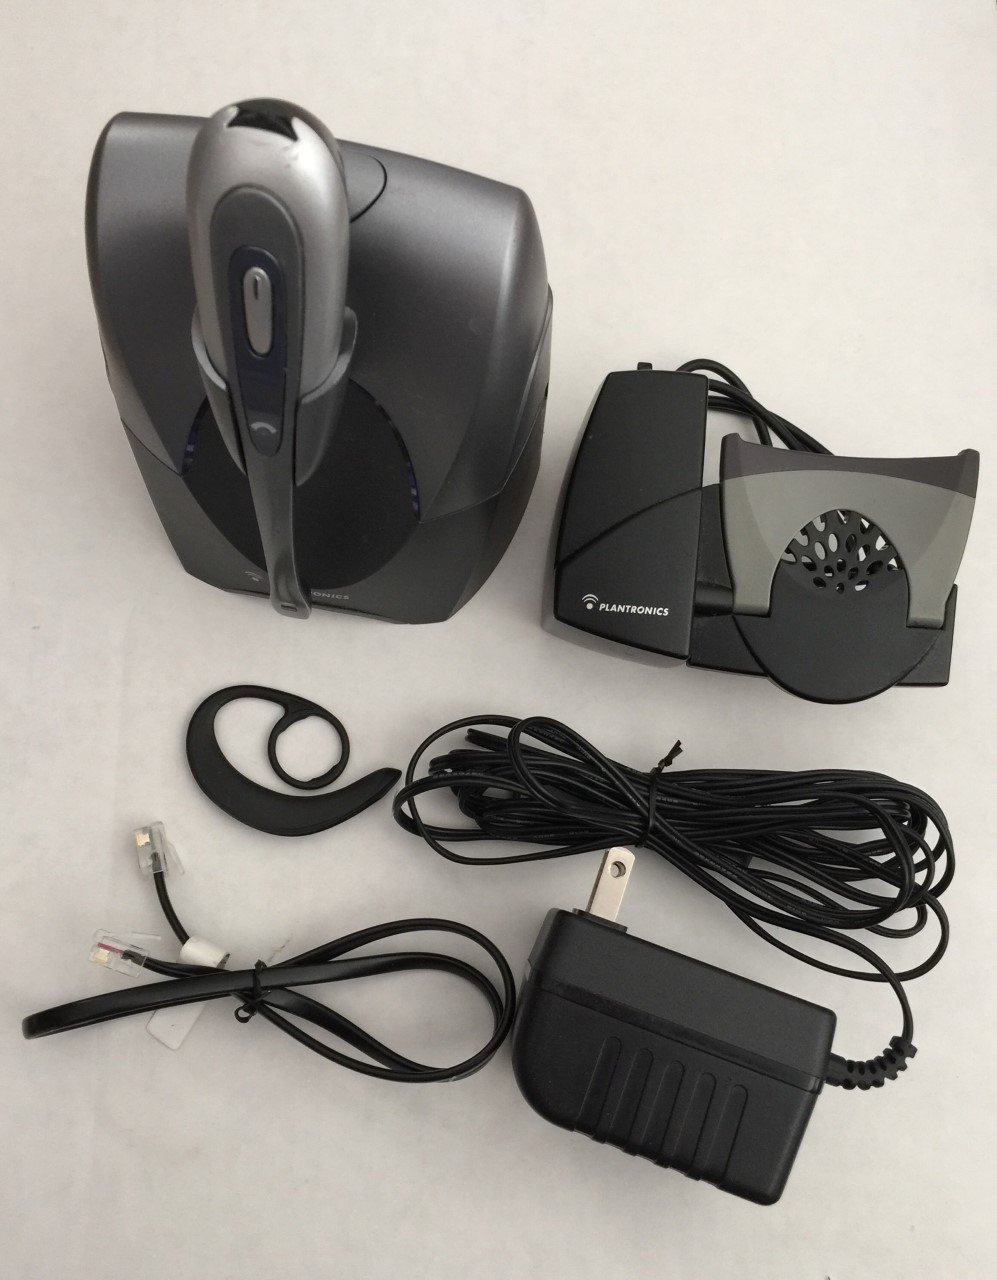 Plantronics Cs55 Hl10 Bundle Wireless Headset Amazon In Electronics